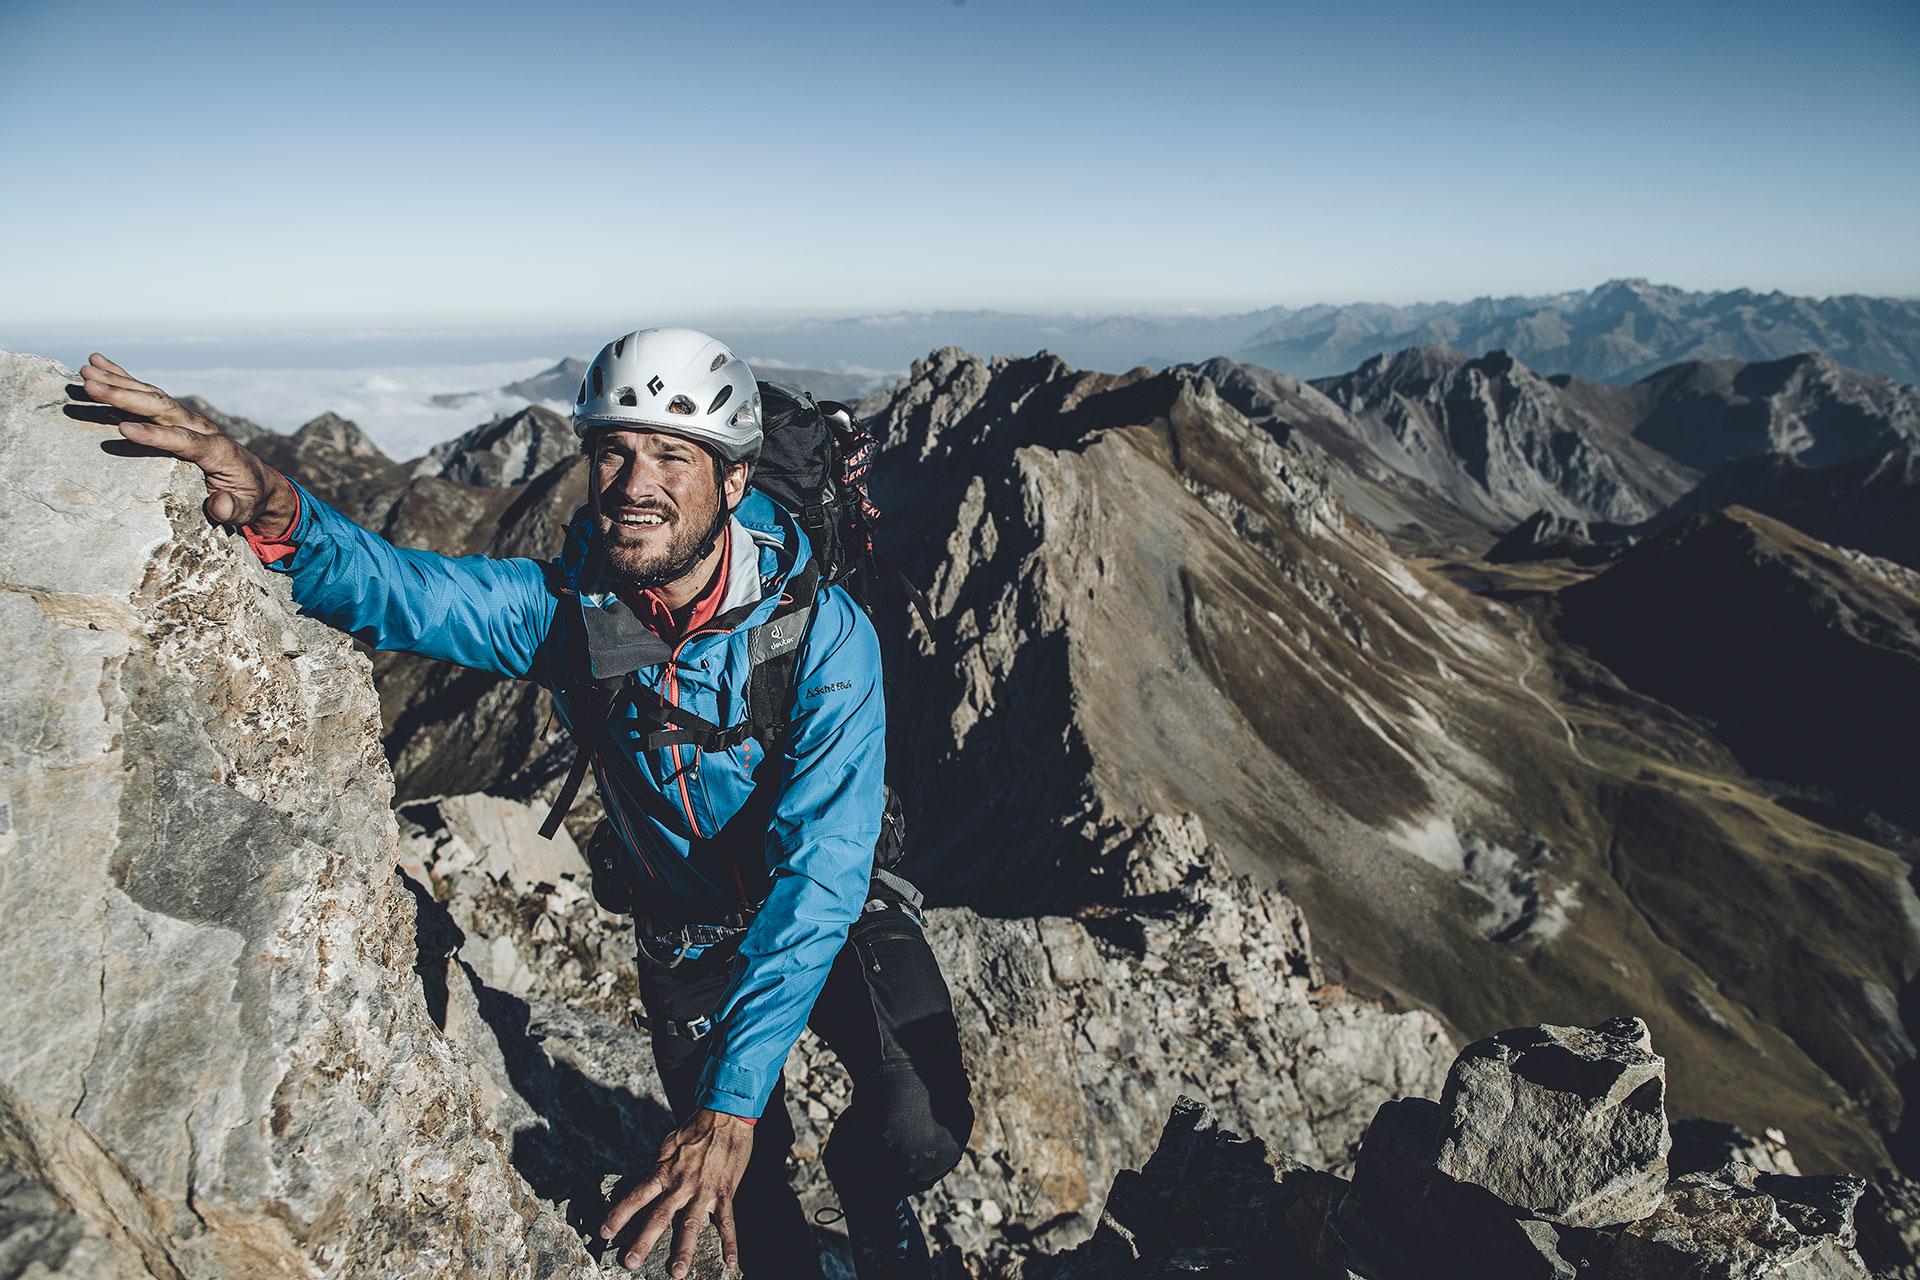 fotografie sport outdoor wandern trekking schoeffel berge seealpen zuerich schweiz